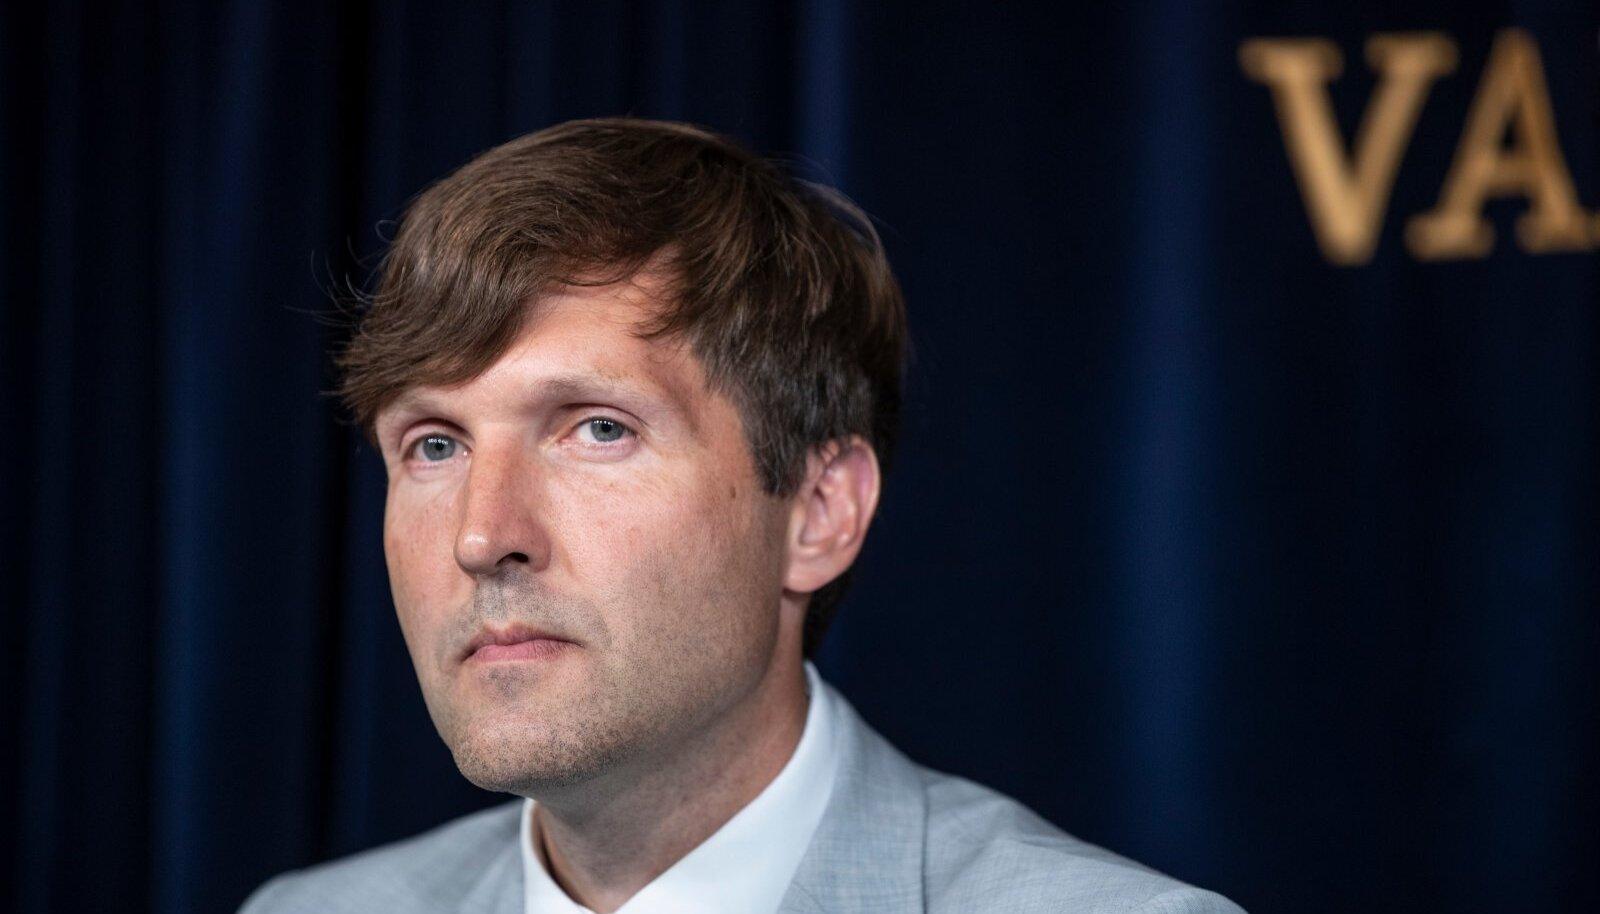 Valitsuse pressikonverents, Martin Helme